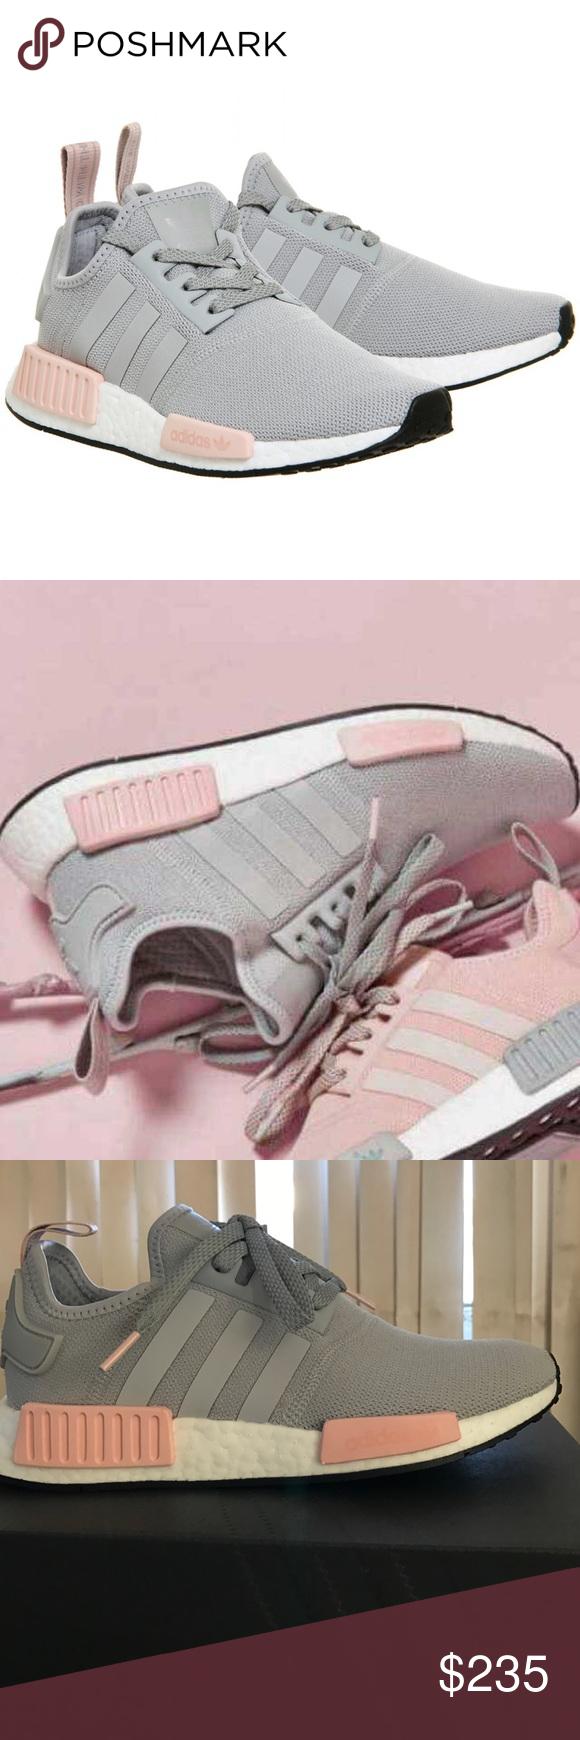 Adidas NMD R1 W Vapour Pink Pink Vapour Light Onix Grau New in box Größe 8 Damens 5296eb